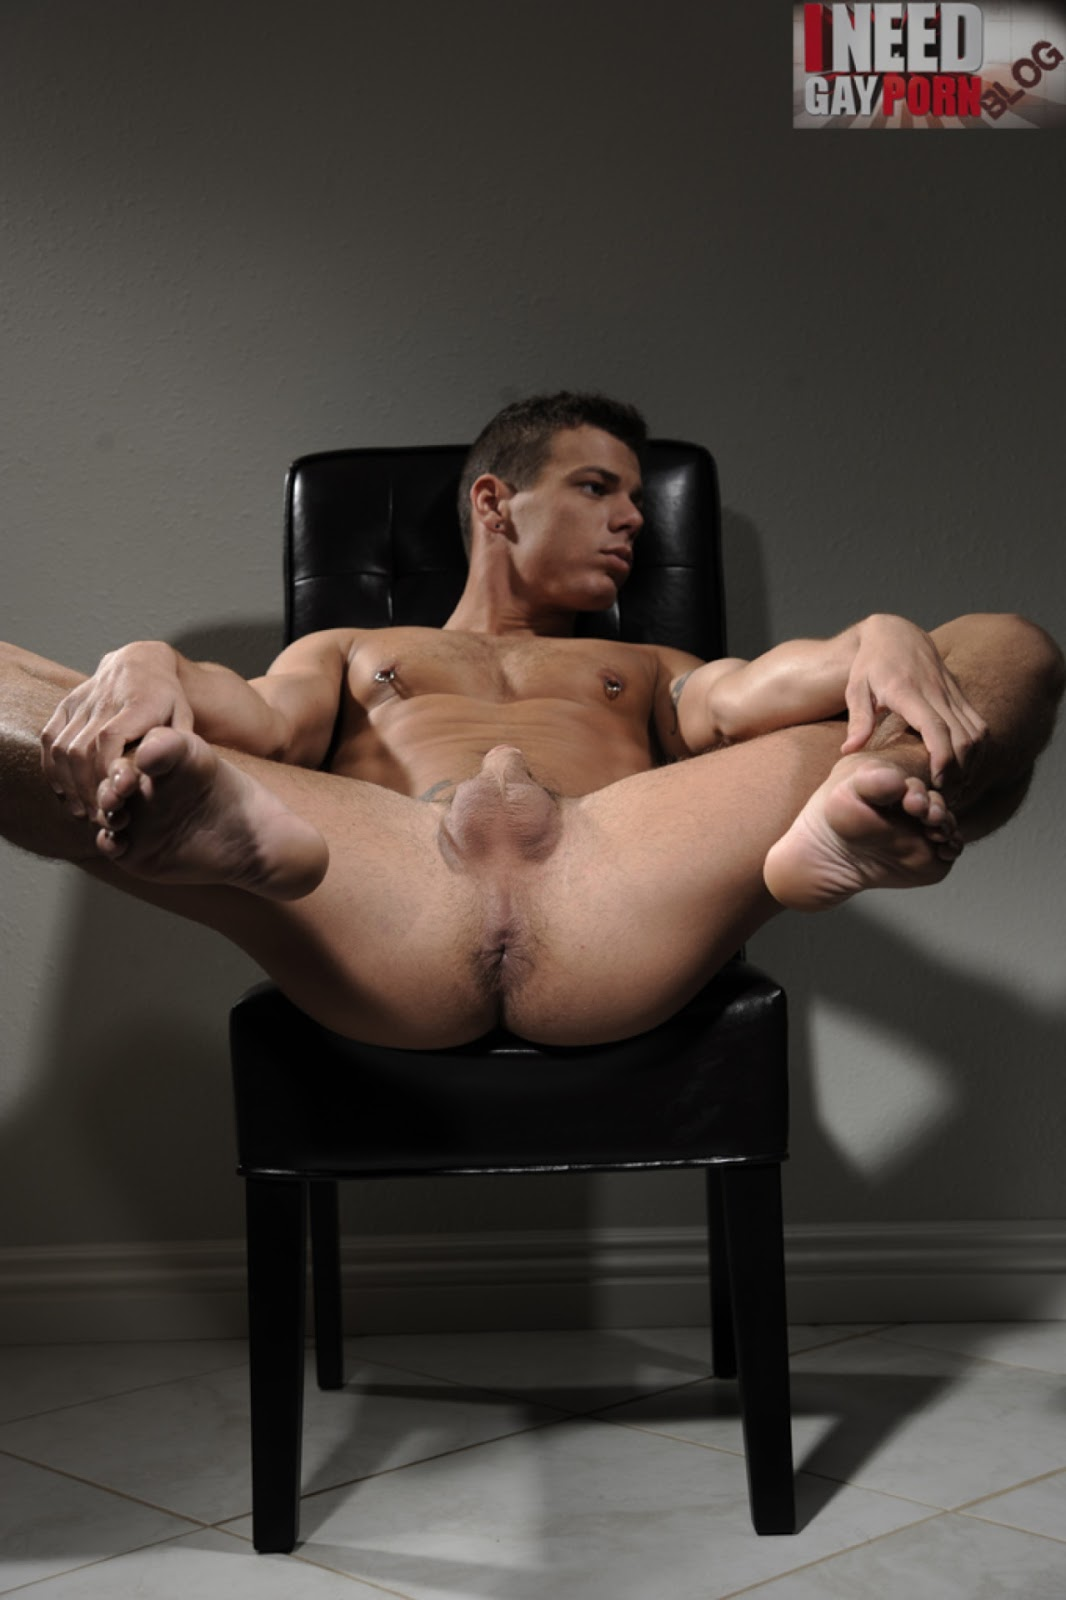 Jesse santana gay porn